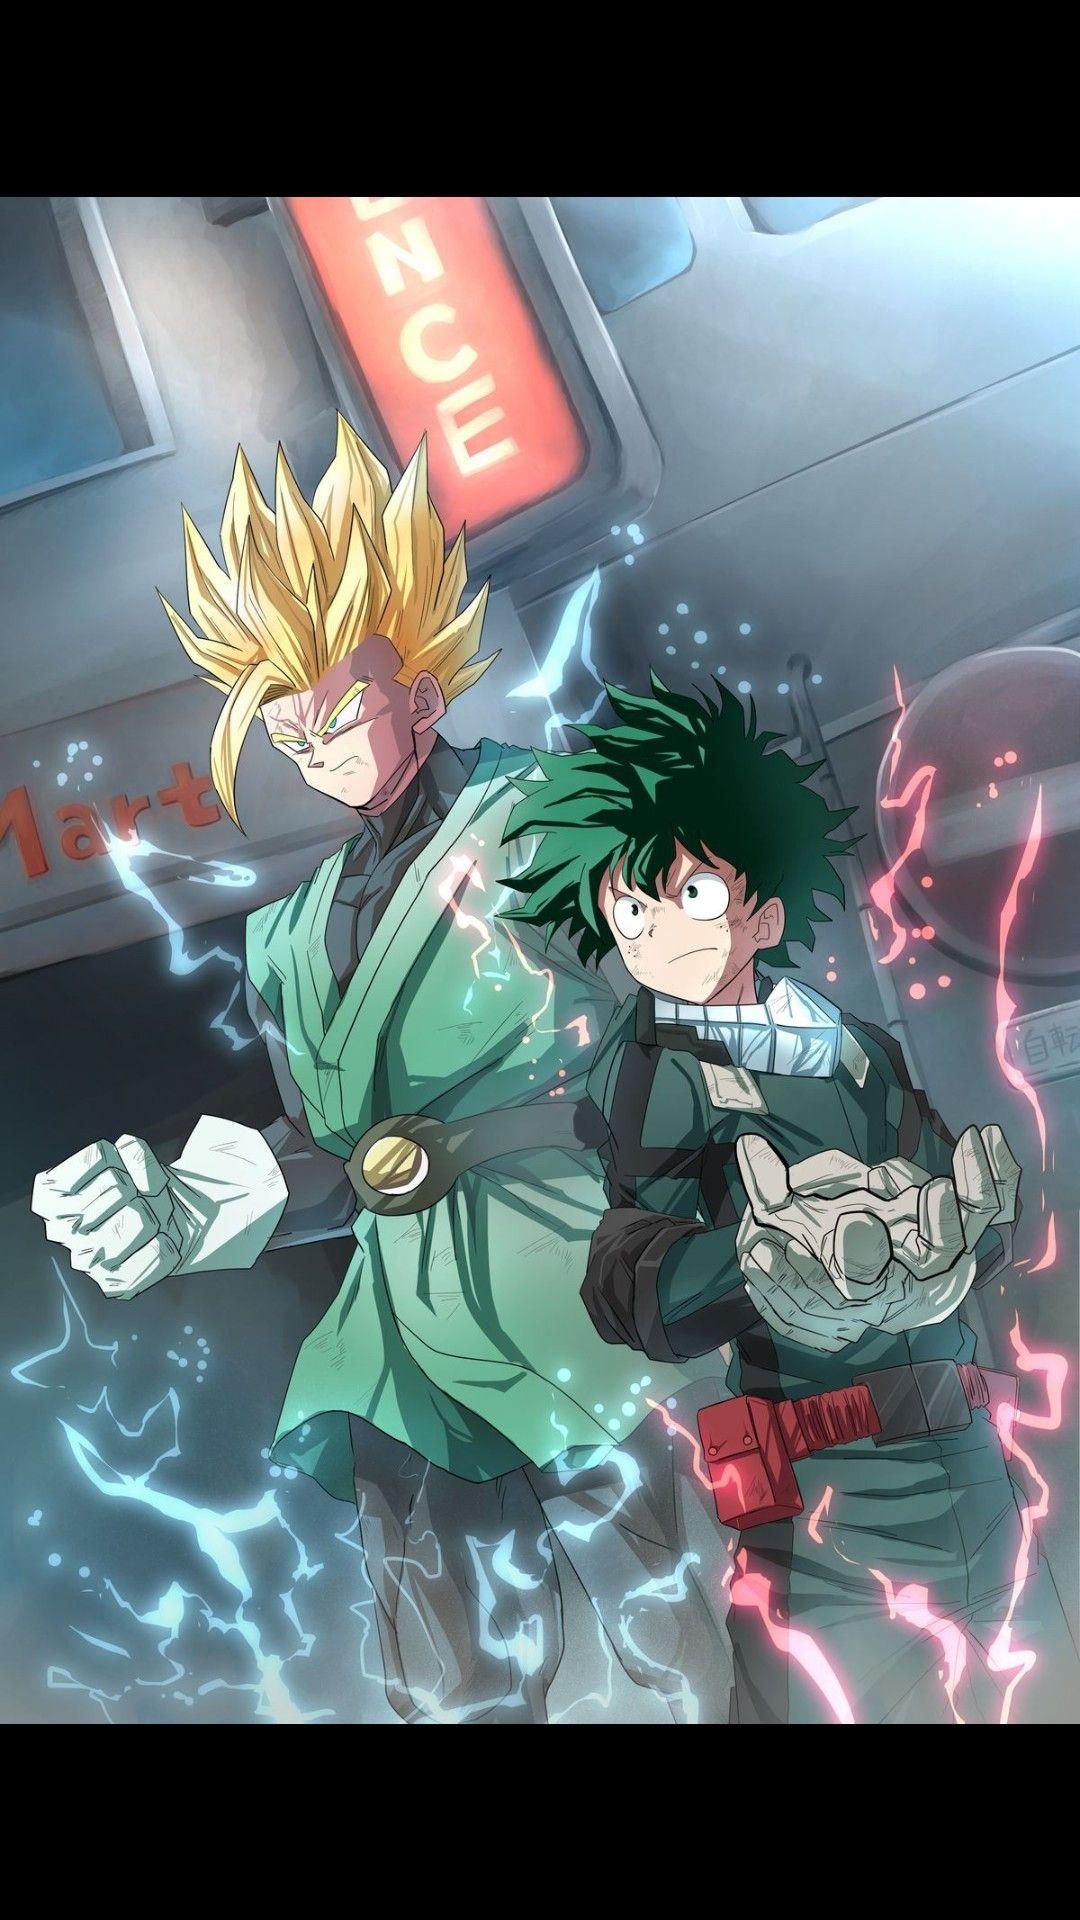 Dragon ball z x my hero academia ssj2 son gohan and izuku midoriya